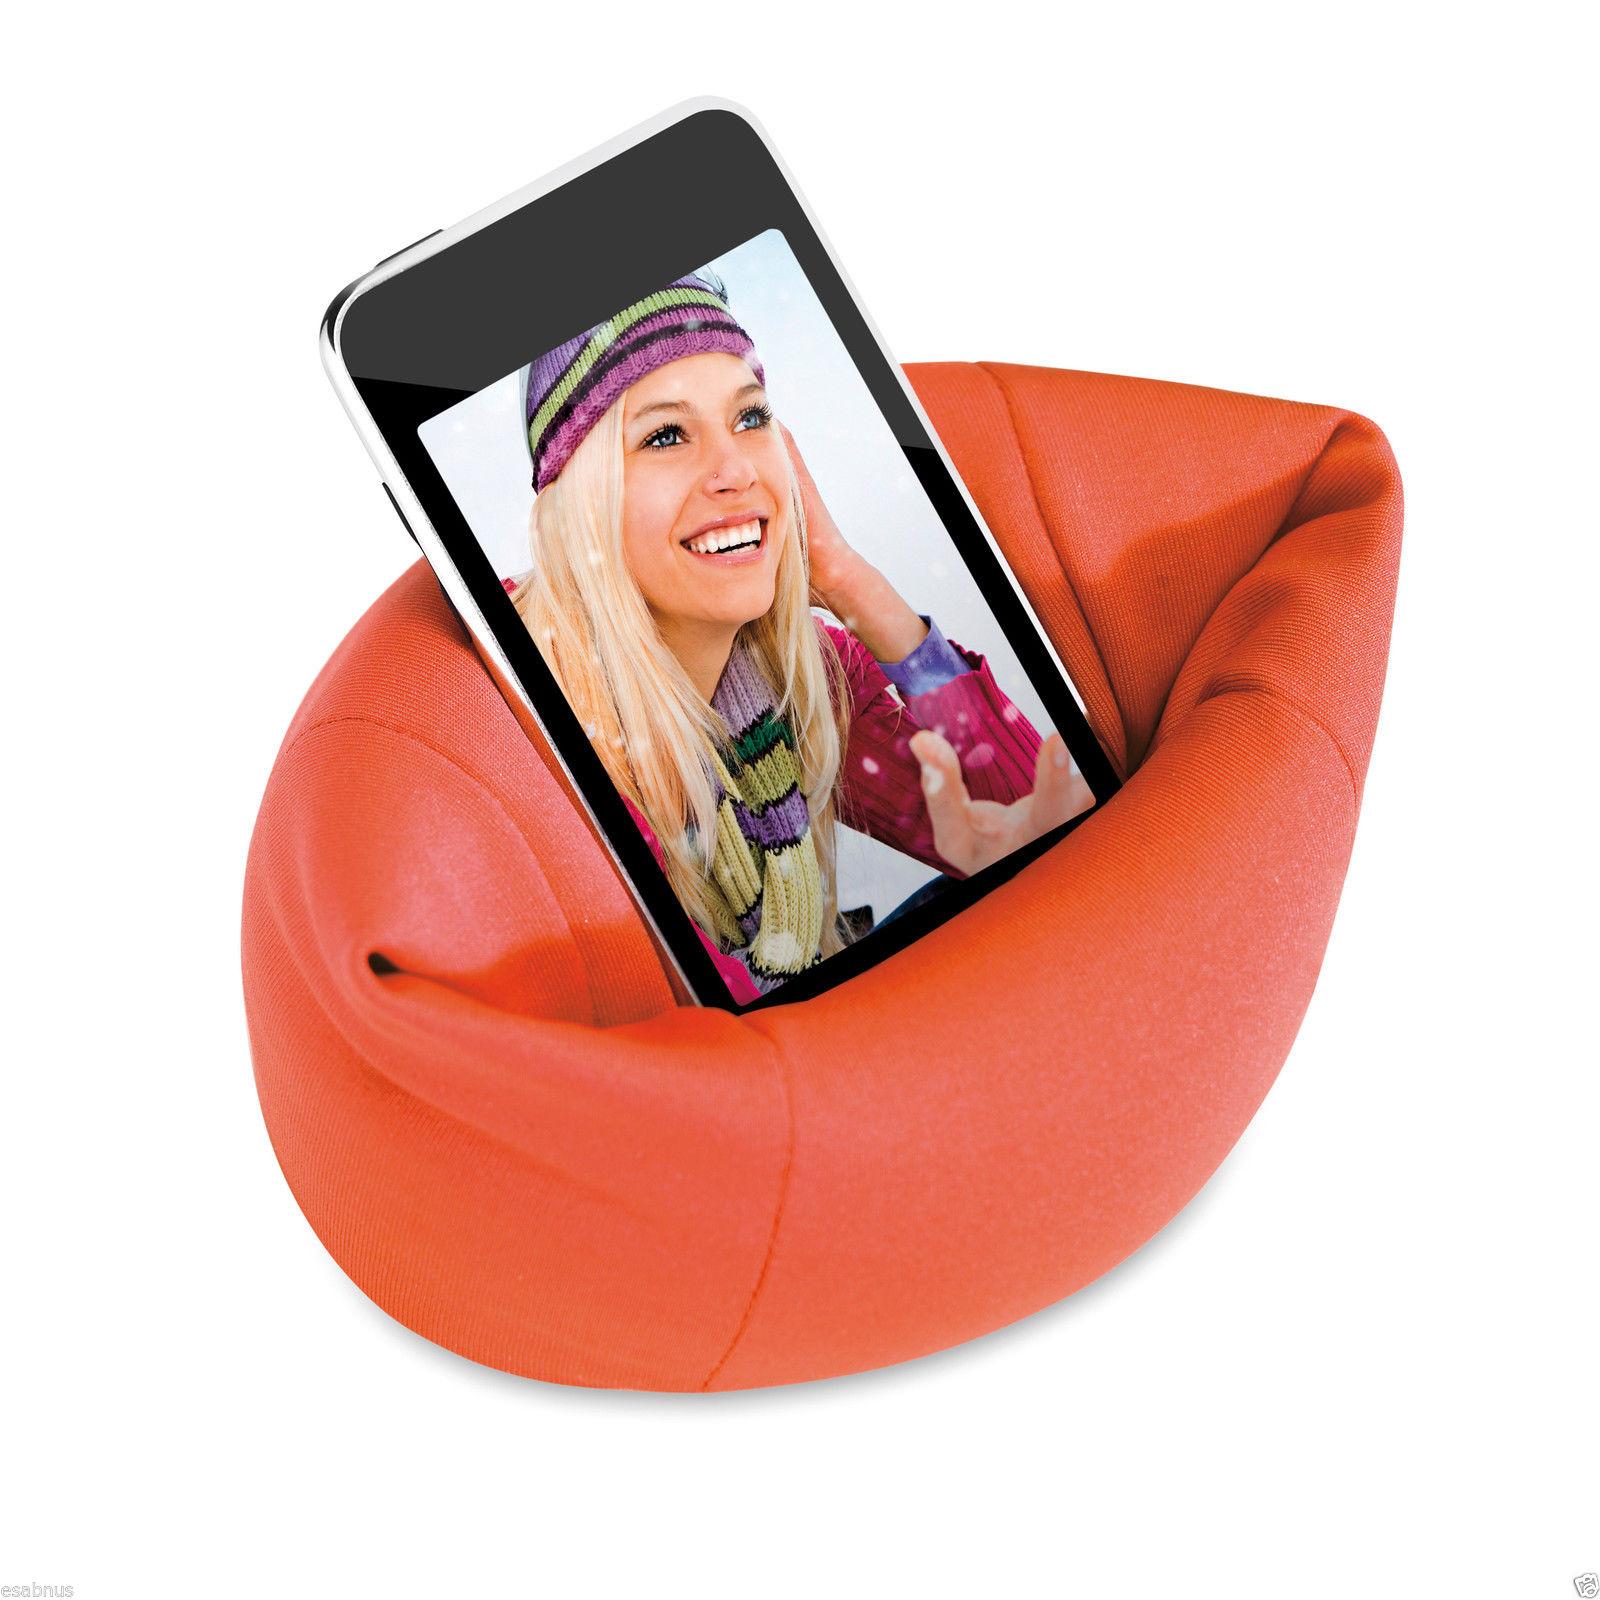 Bean Bag Sofa Chair Mobile Phone Holder To